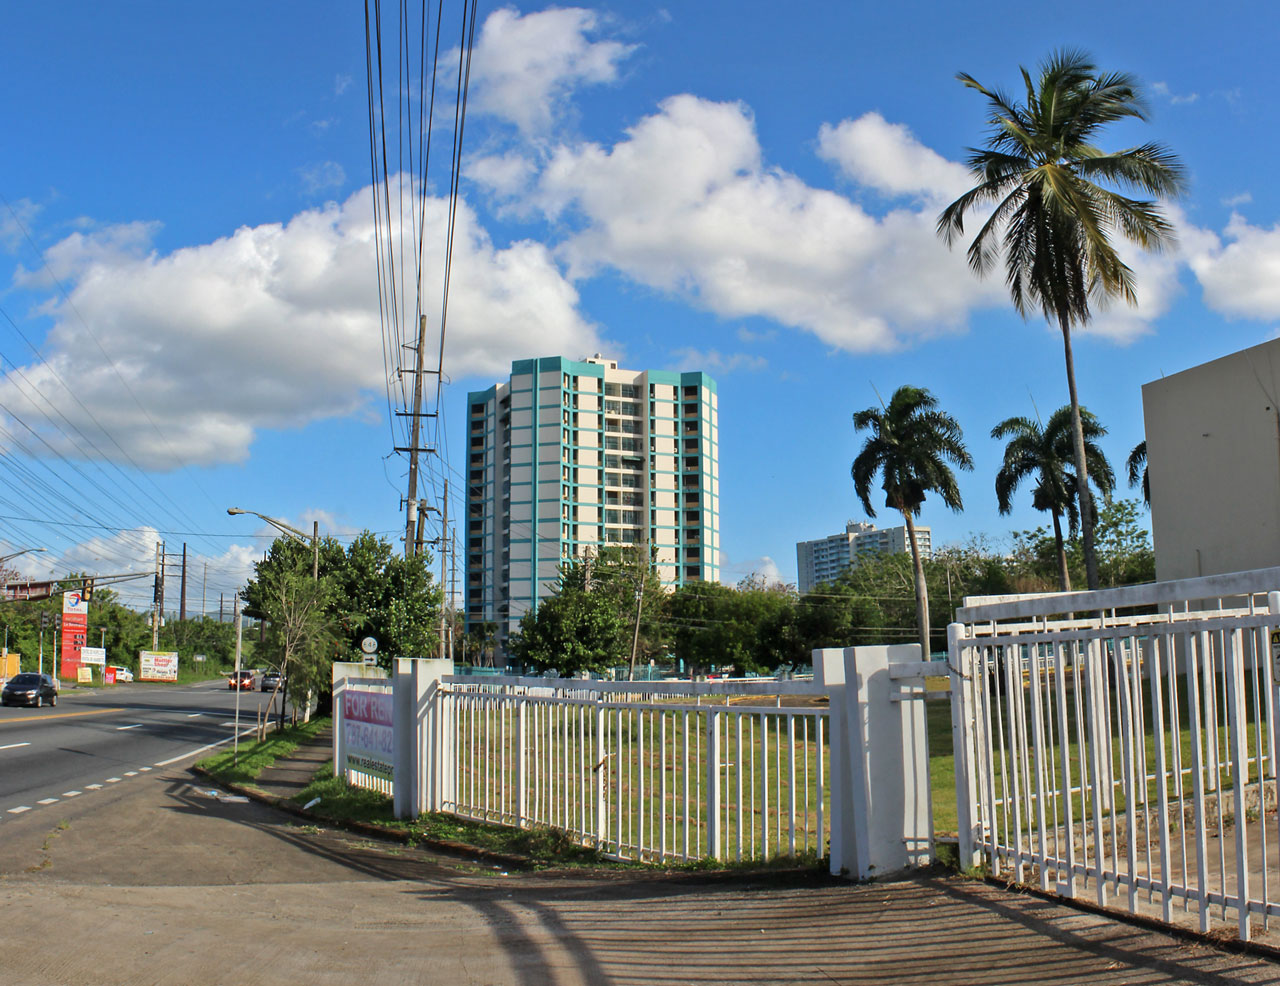 Condominio Torres de Carolina, San Antón, Carolina, Puerto Rico.